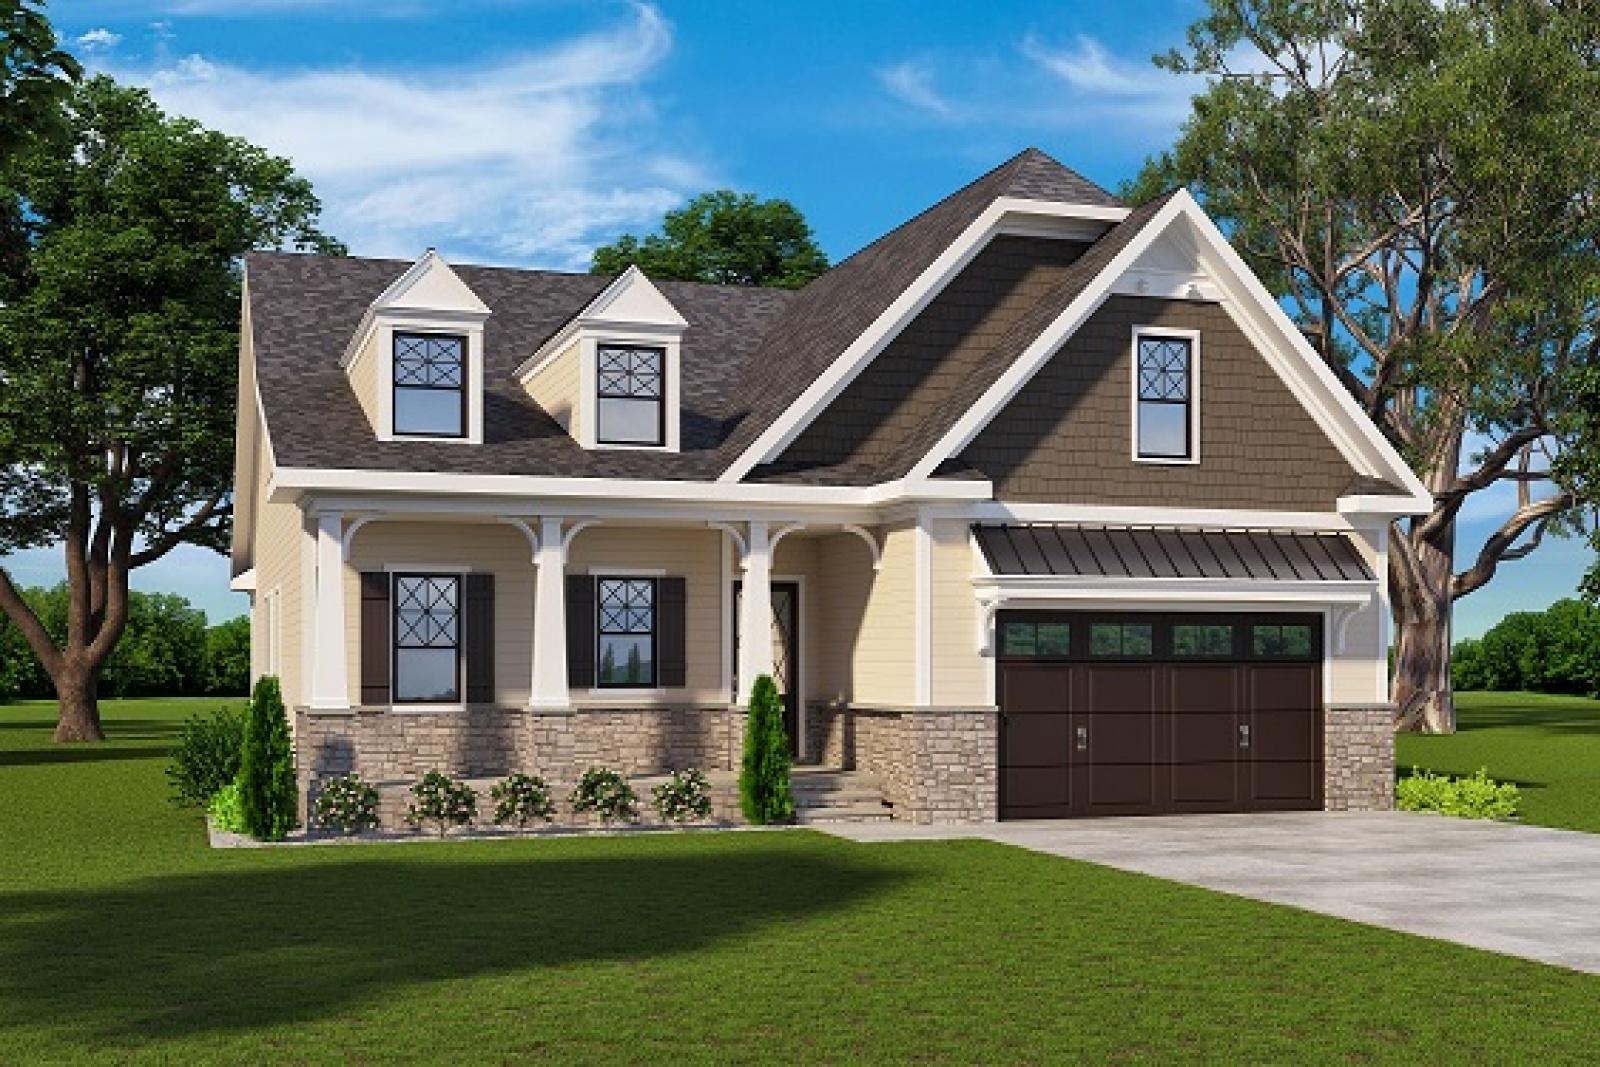 2163 Mackenna Drive, Graham, North Carolina 27253, 3 Bedrooms Bedrooms, 8 Rooms Rooms,2 BathroomsBathrooms,Shamrock Valley Townhomes,For Sale,Cameron,Mackenna,2,1055